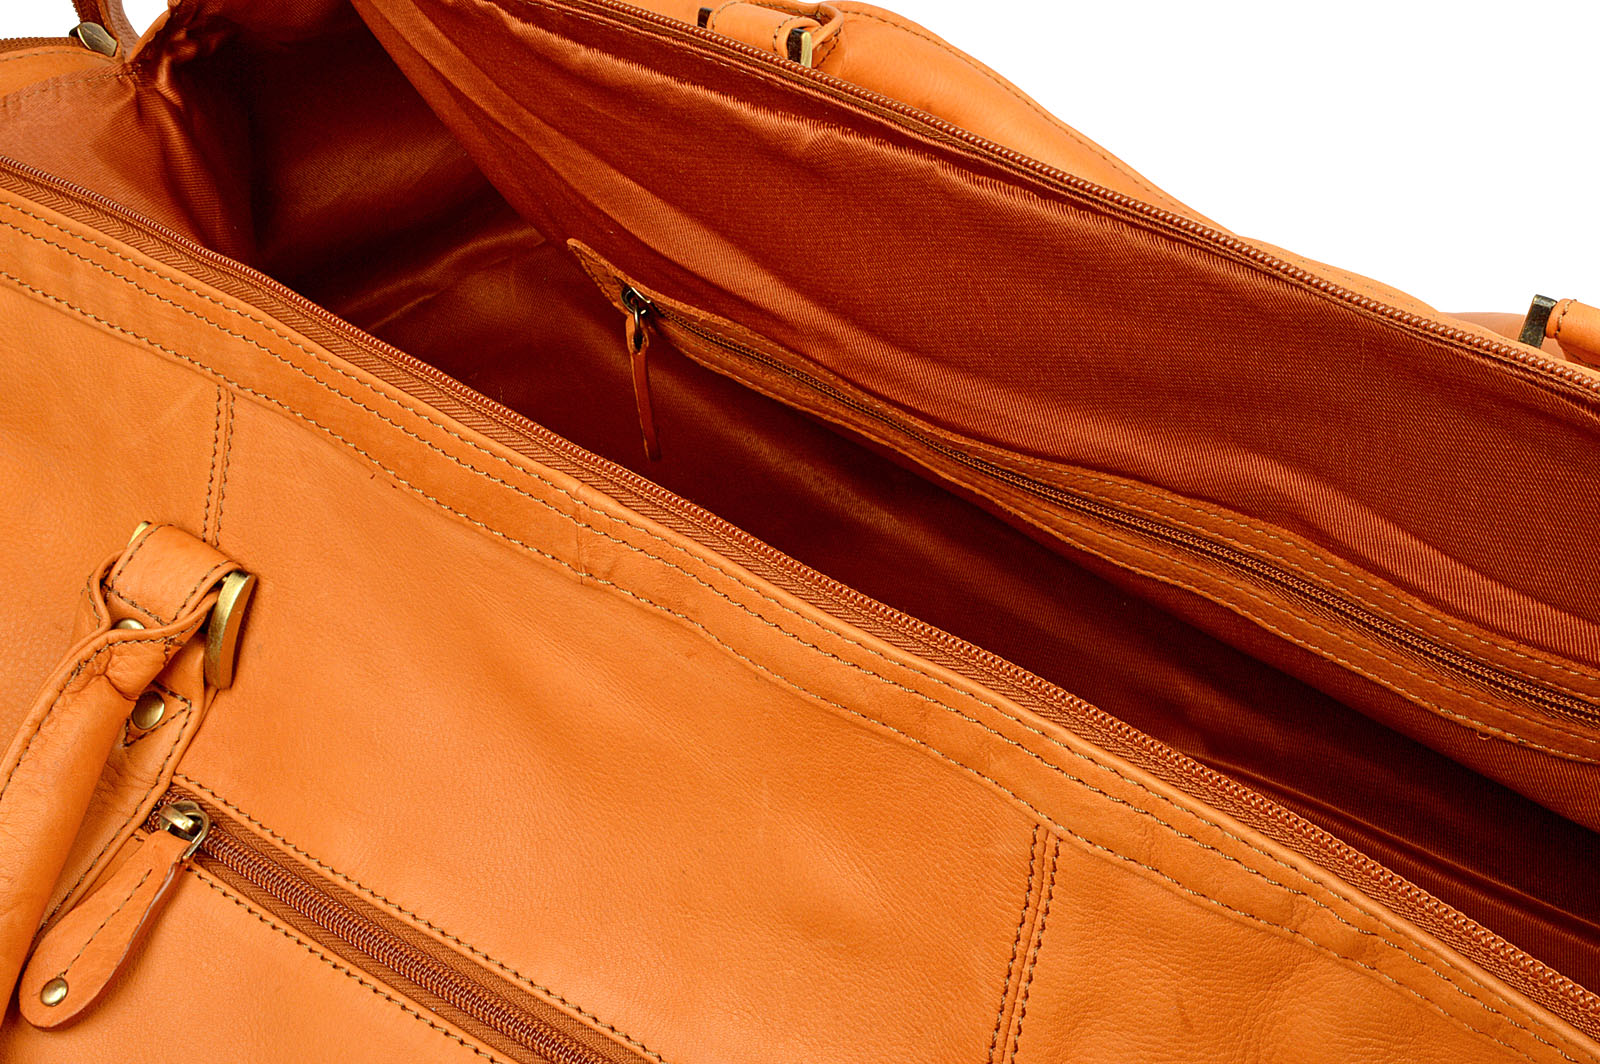 ... Woodland Leather Tan Large Size Travel Holdall With Adjustable Shoulder  Strap 8764eeb270b27